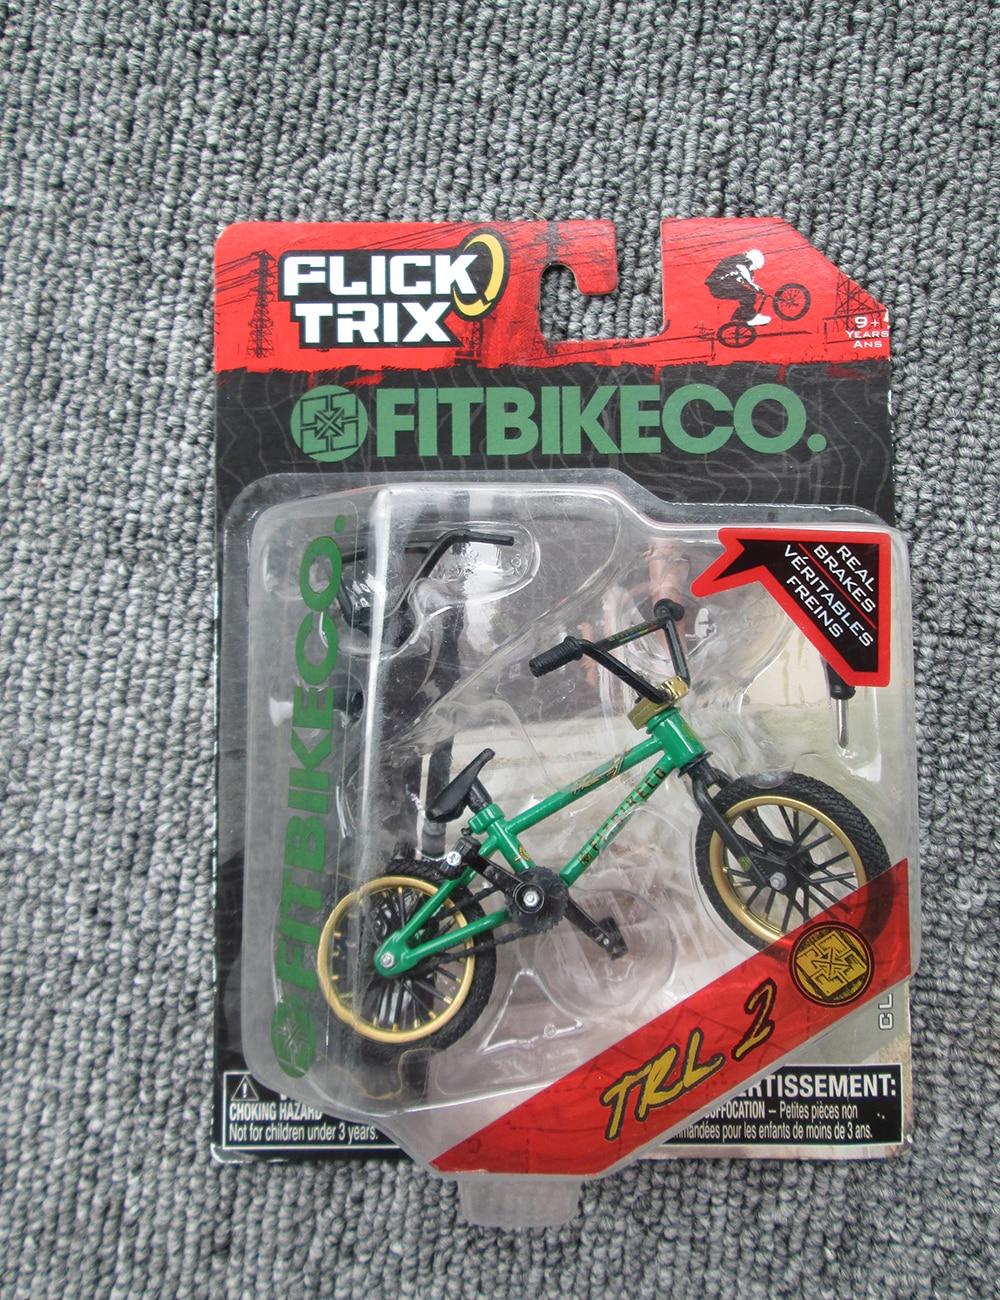 Hot Sale! Mini DIY flick trix Finger bike Bmx Diecast Nickel Finger Bicycle interesting toys GIFT for children kids Toys